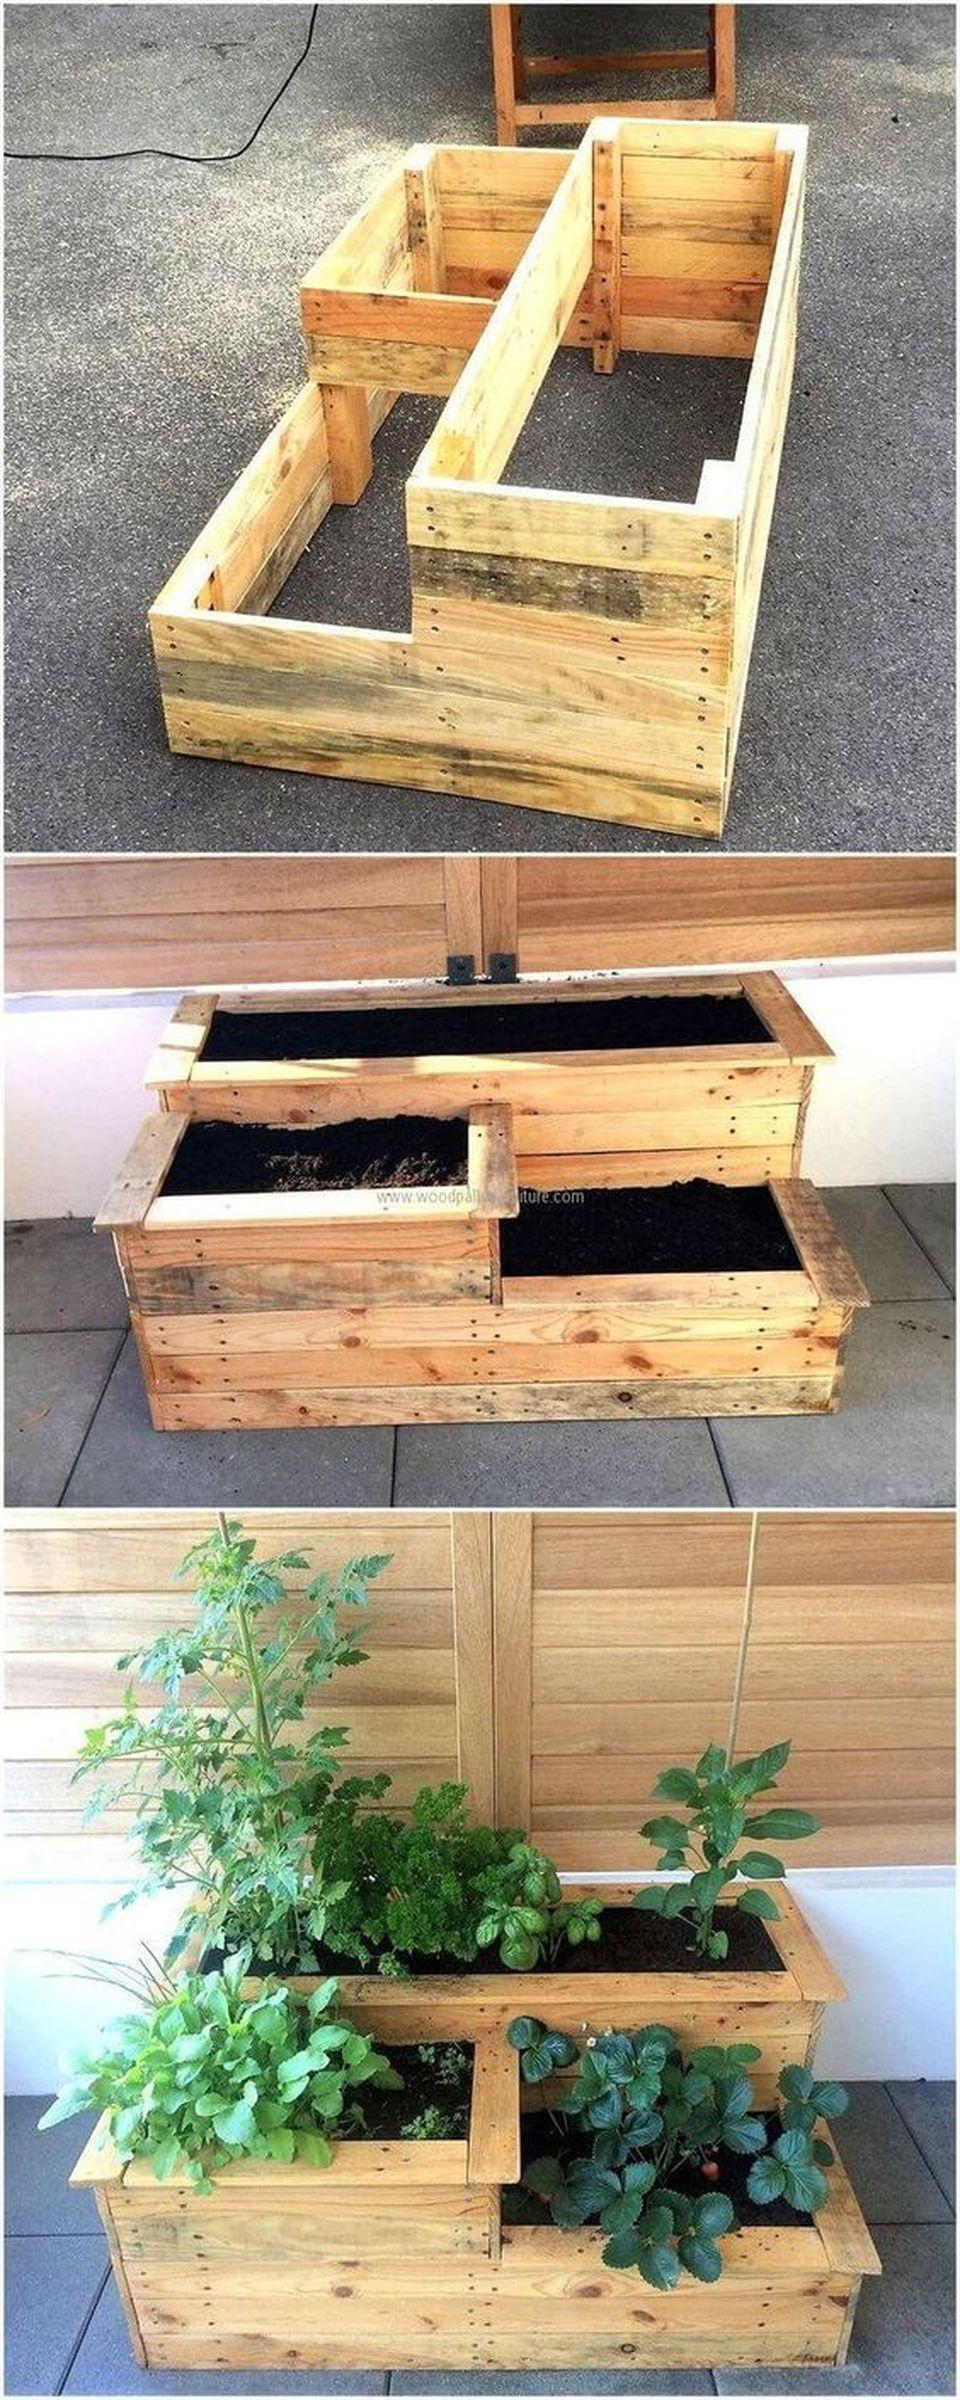 Planter wooden pallet: 74 models to oneself